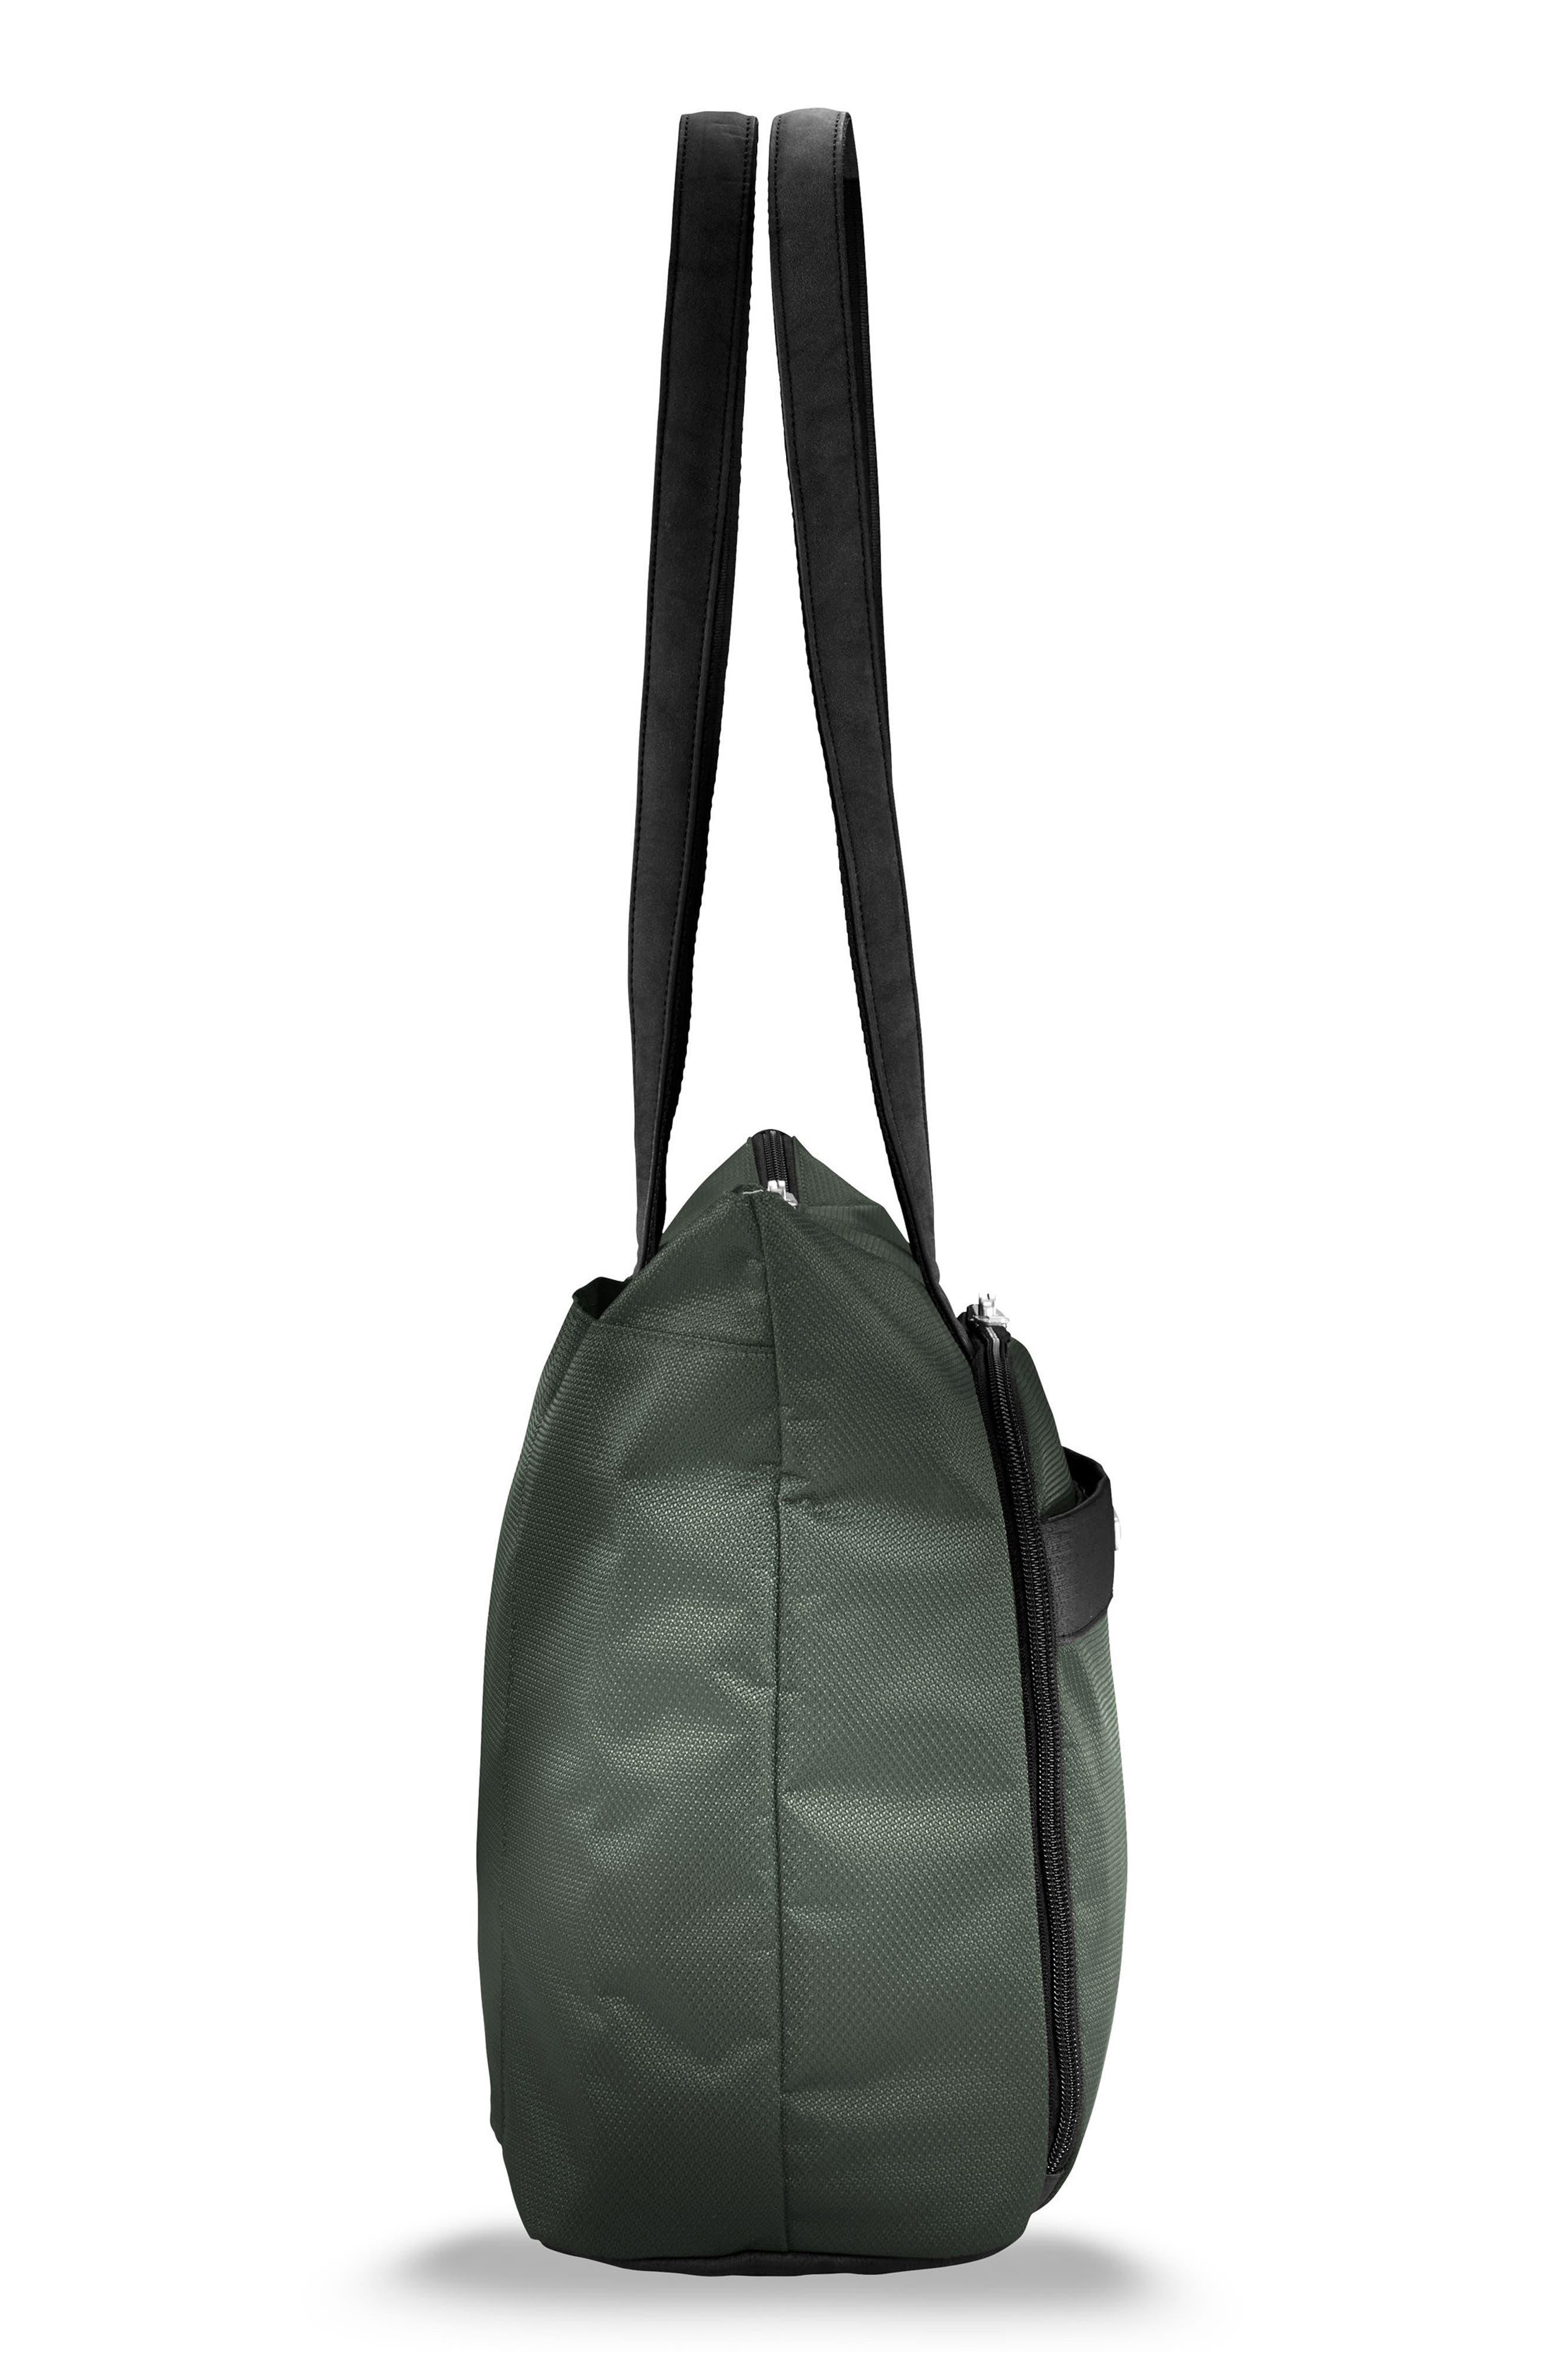 Transcend 400 Tote Bag,                             Alternate thumbnail 10, color,                             Rainforest Green